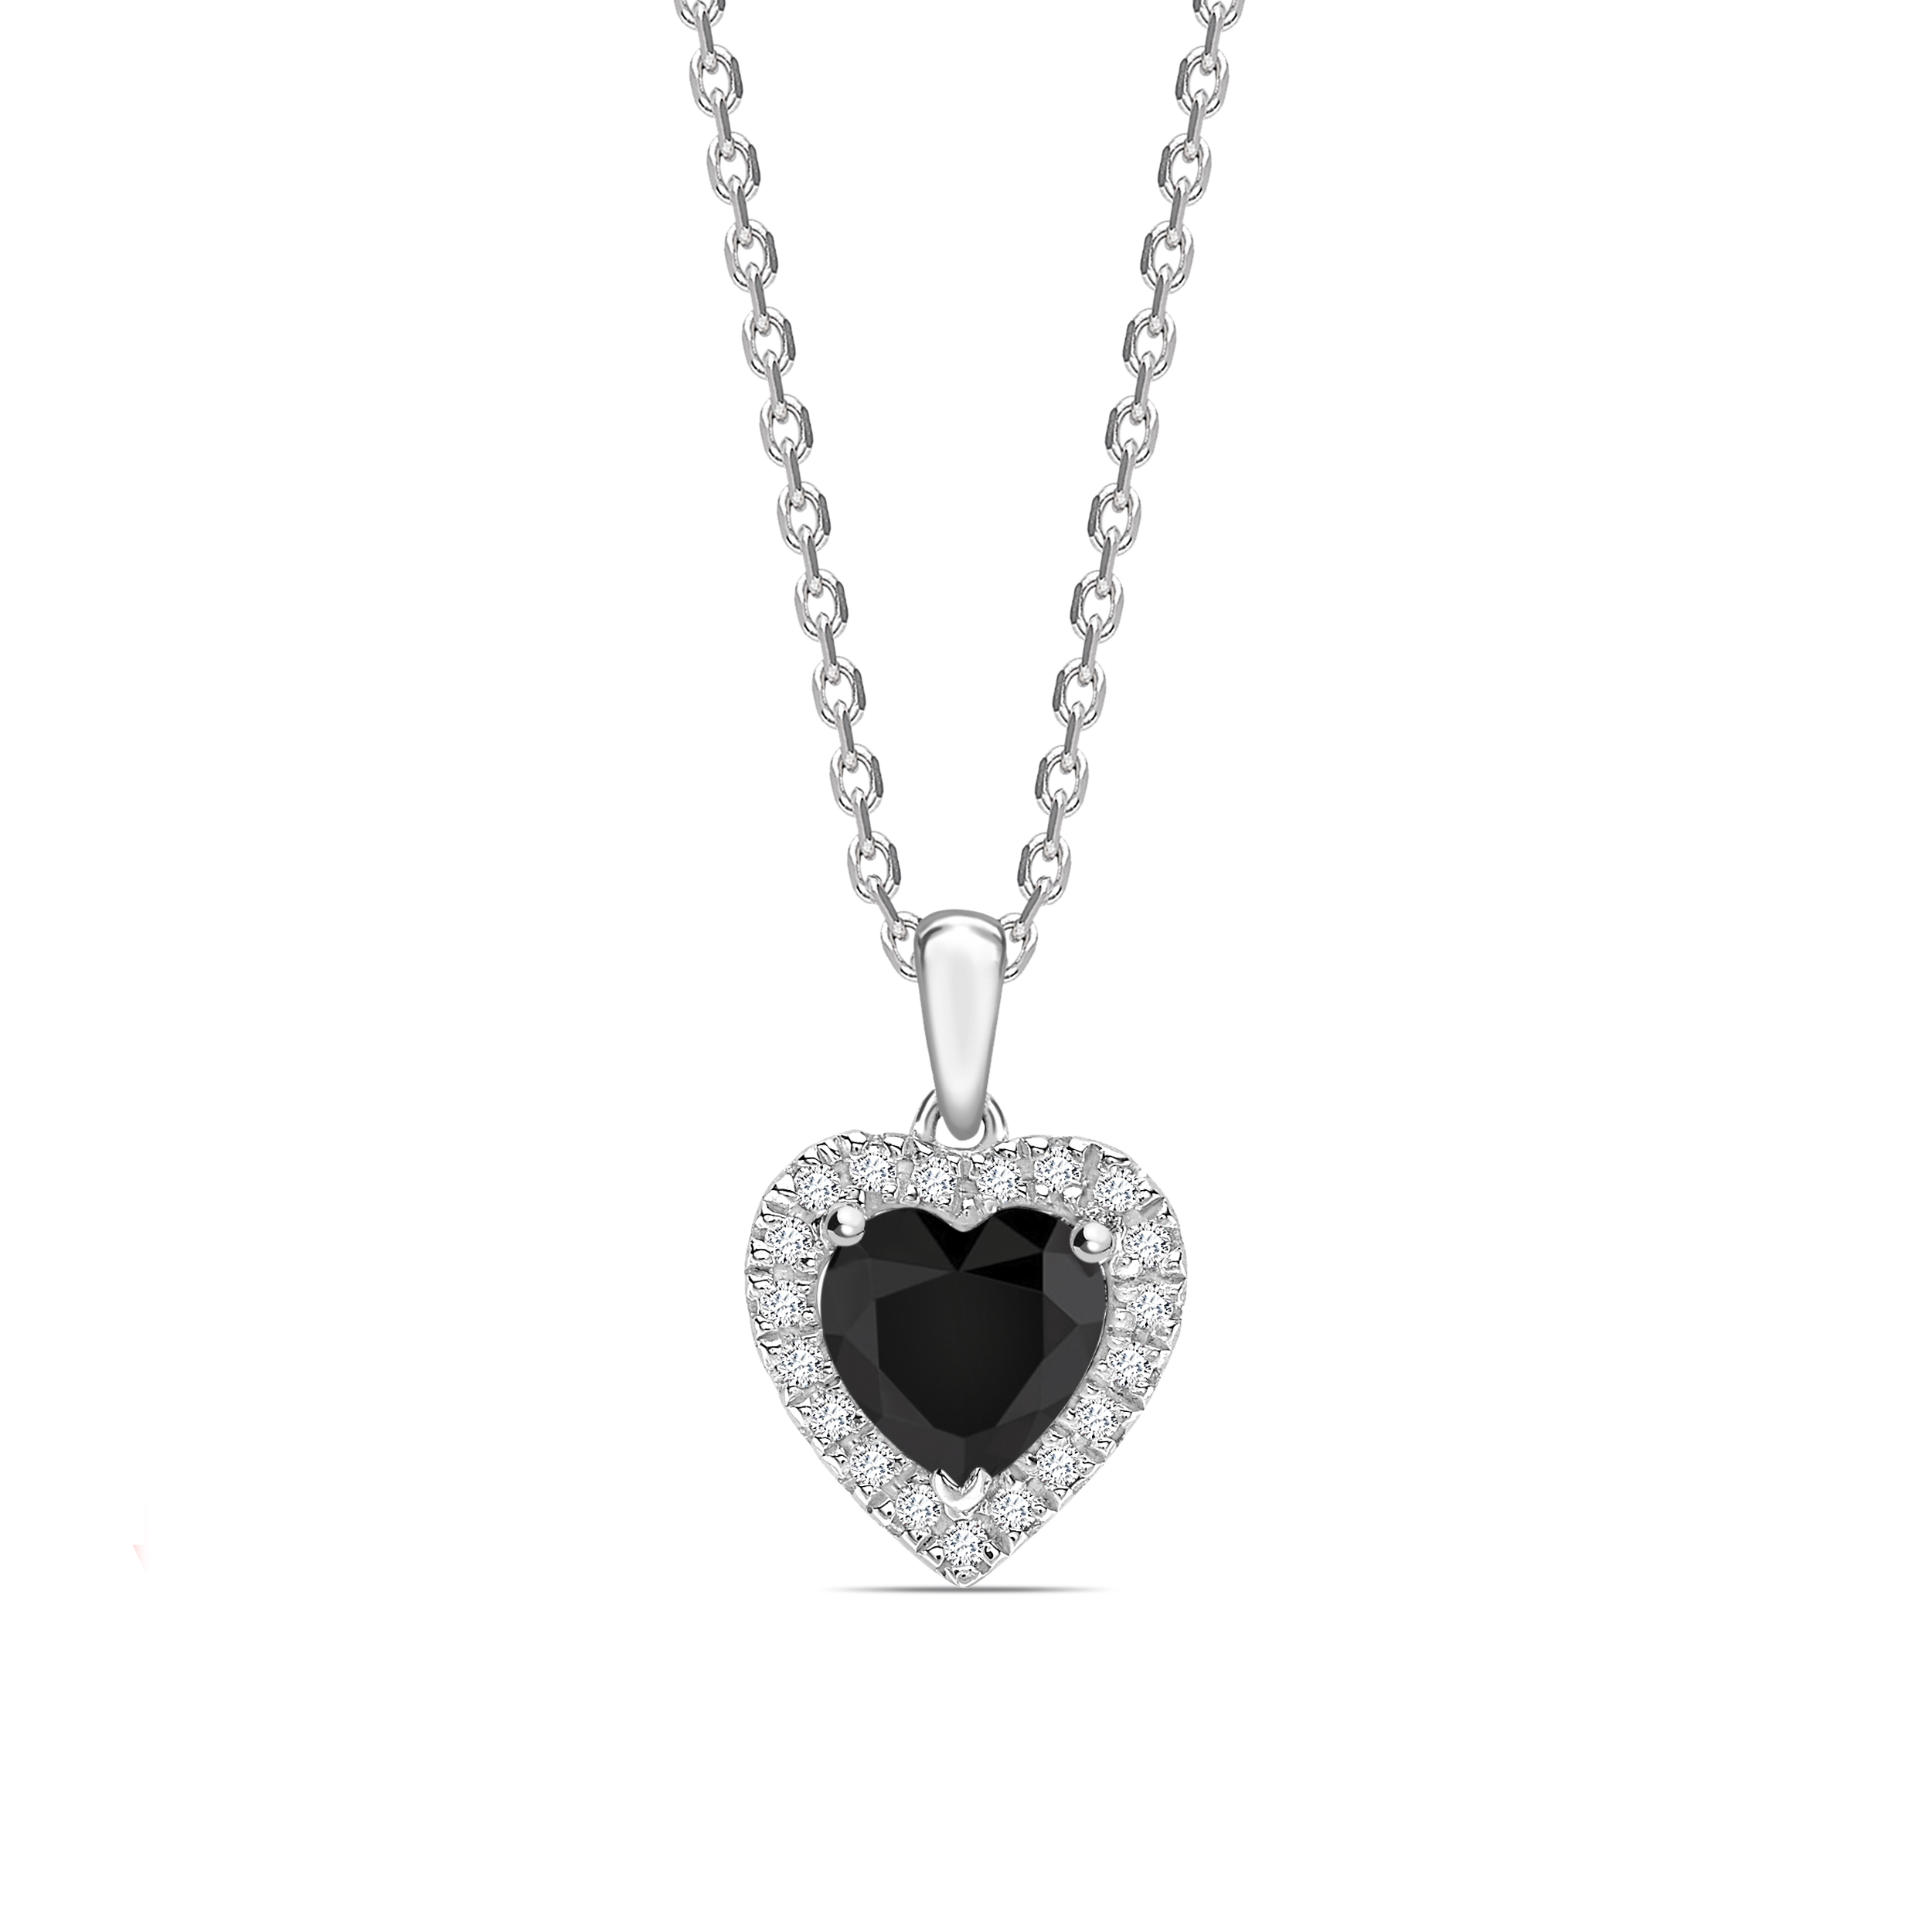 Halo Style Heart Shape Black Diamond Solitaire Pendants Necklace